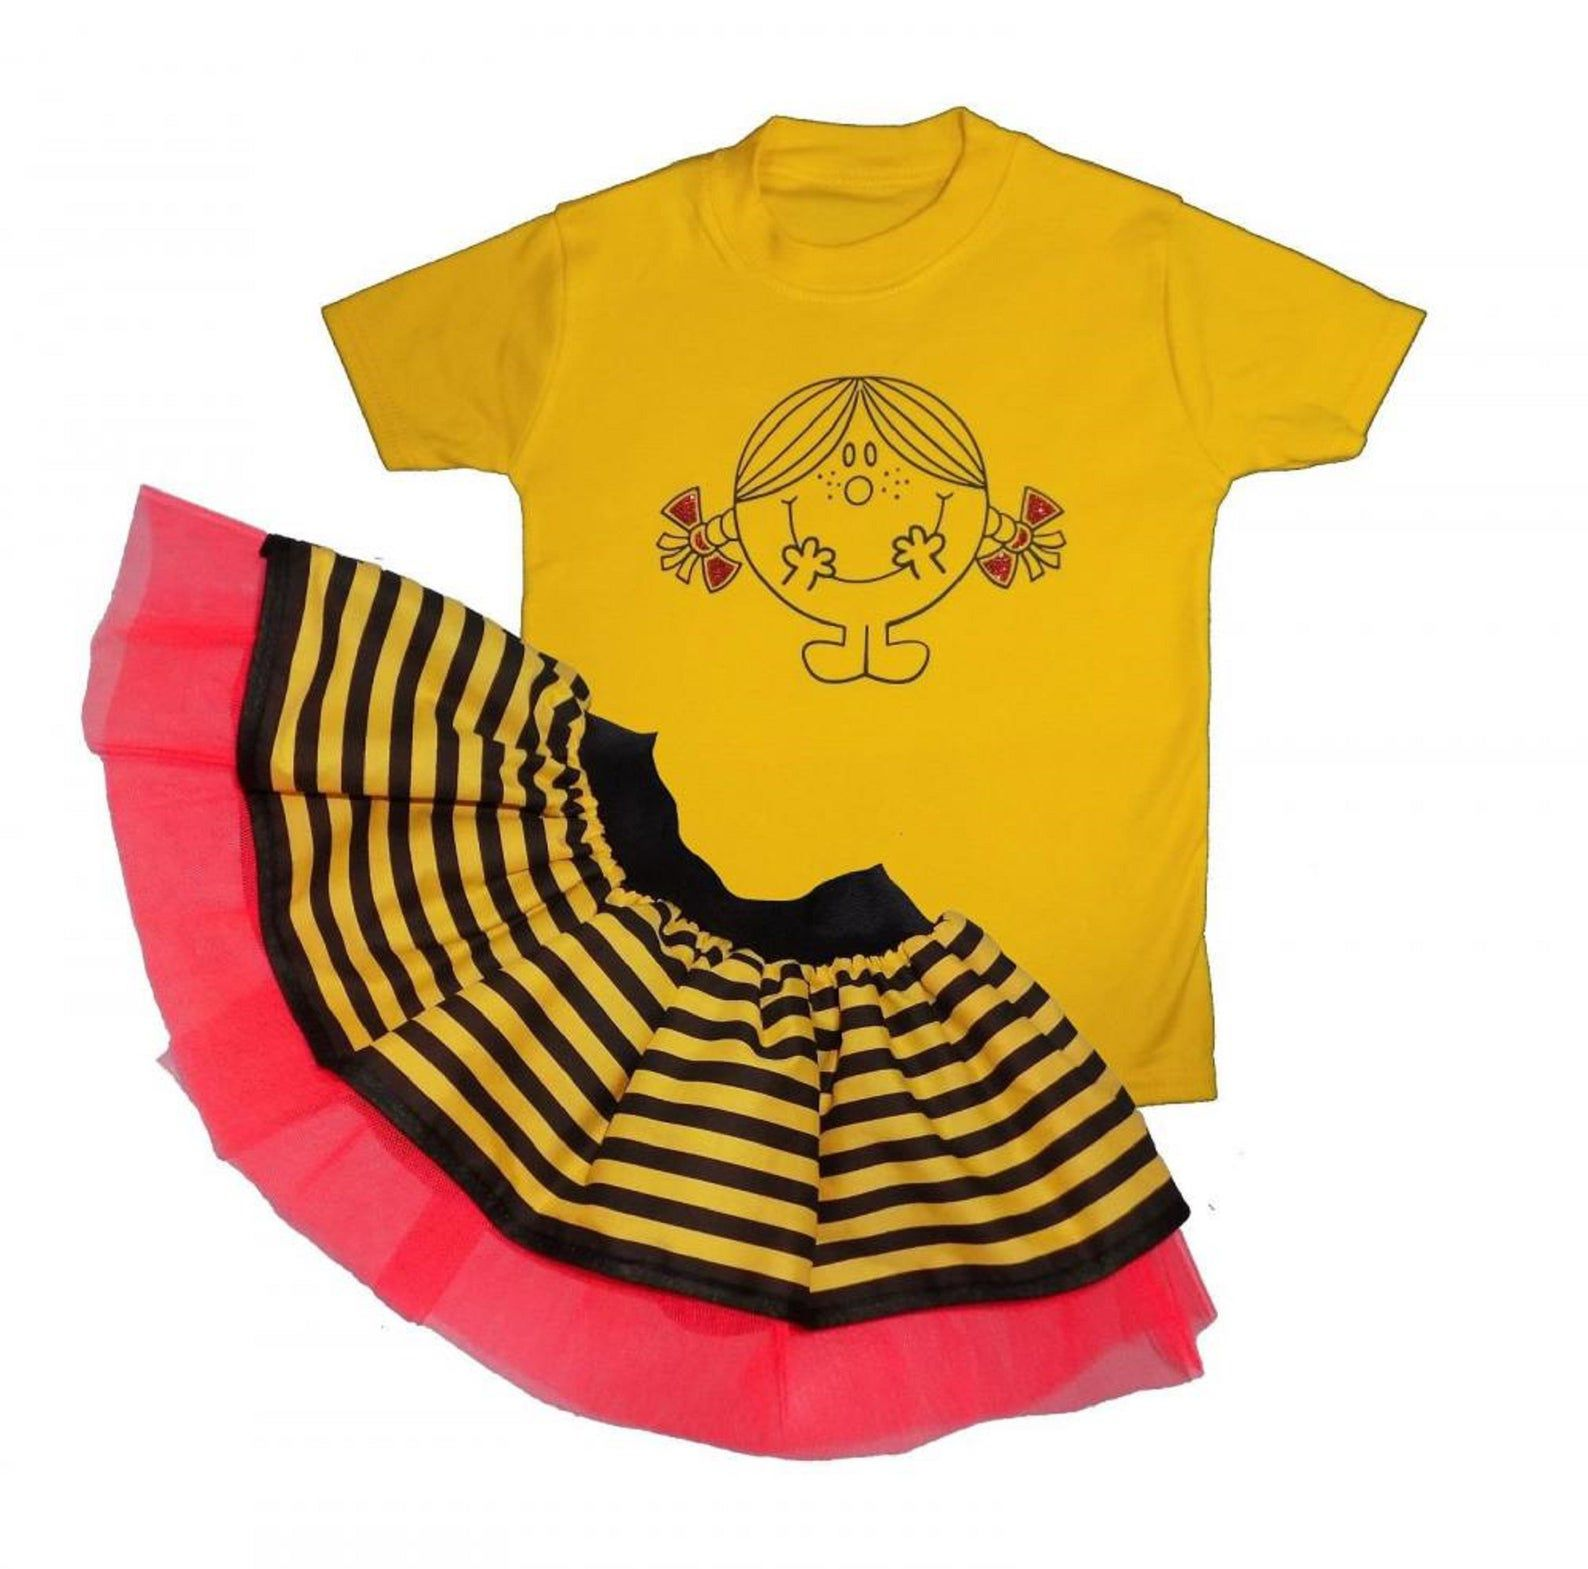 Image of Little Miss Sunshine costume.